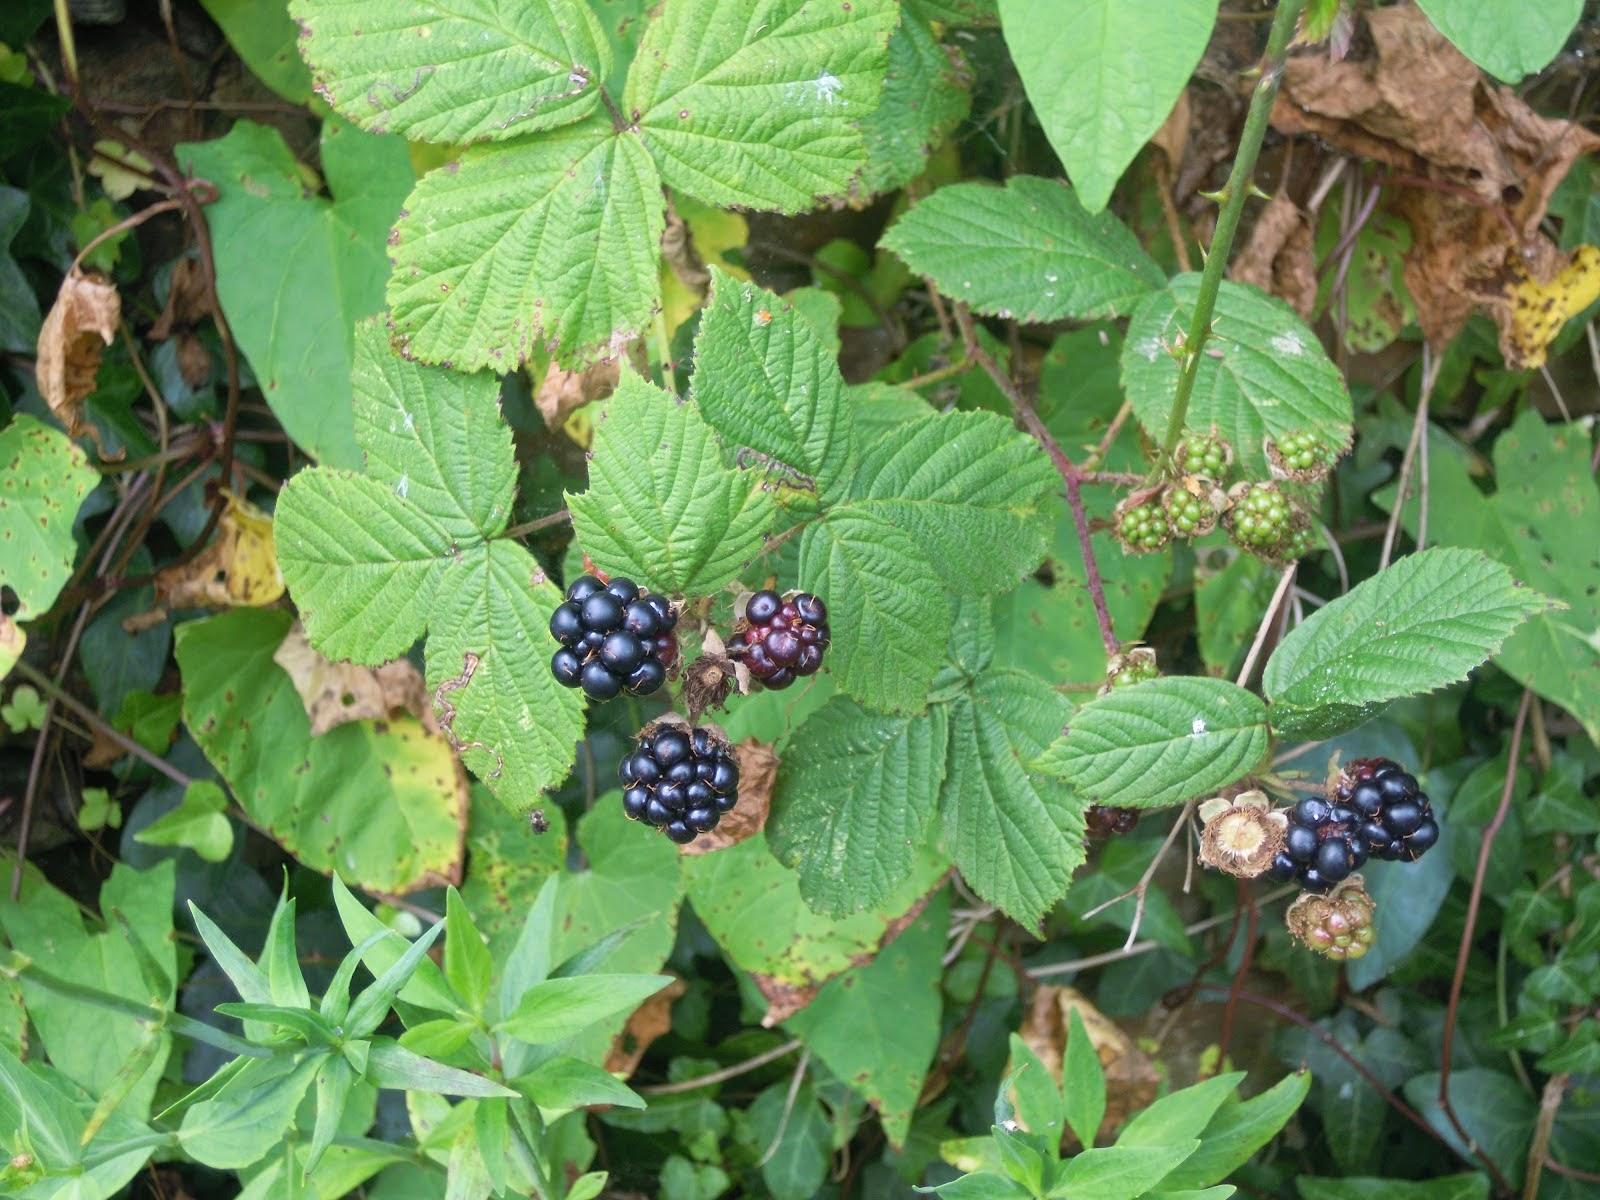 Blackberry leaf